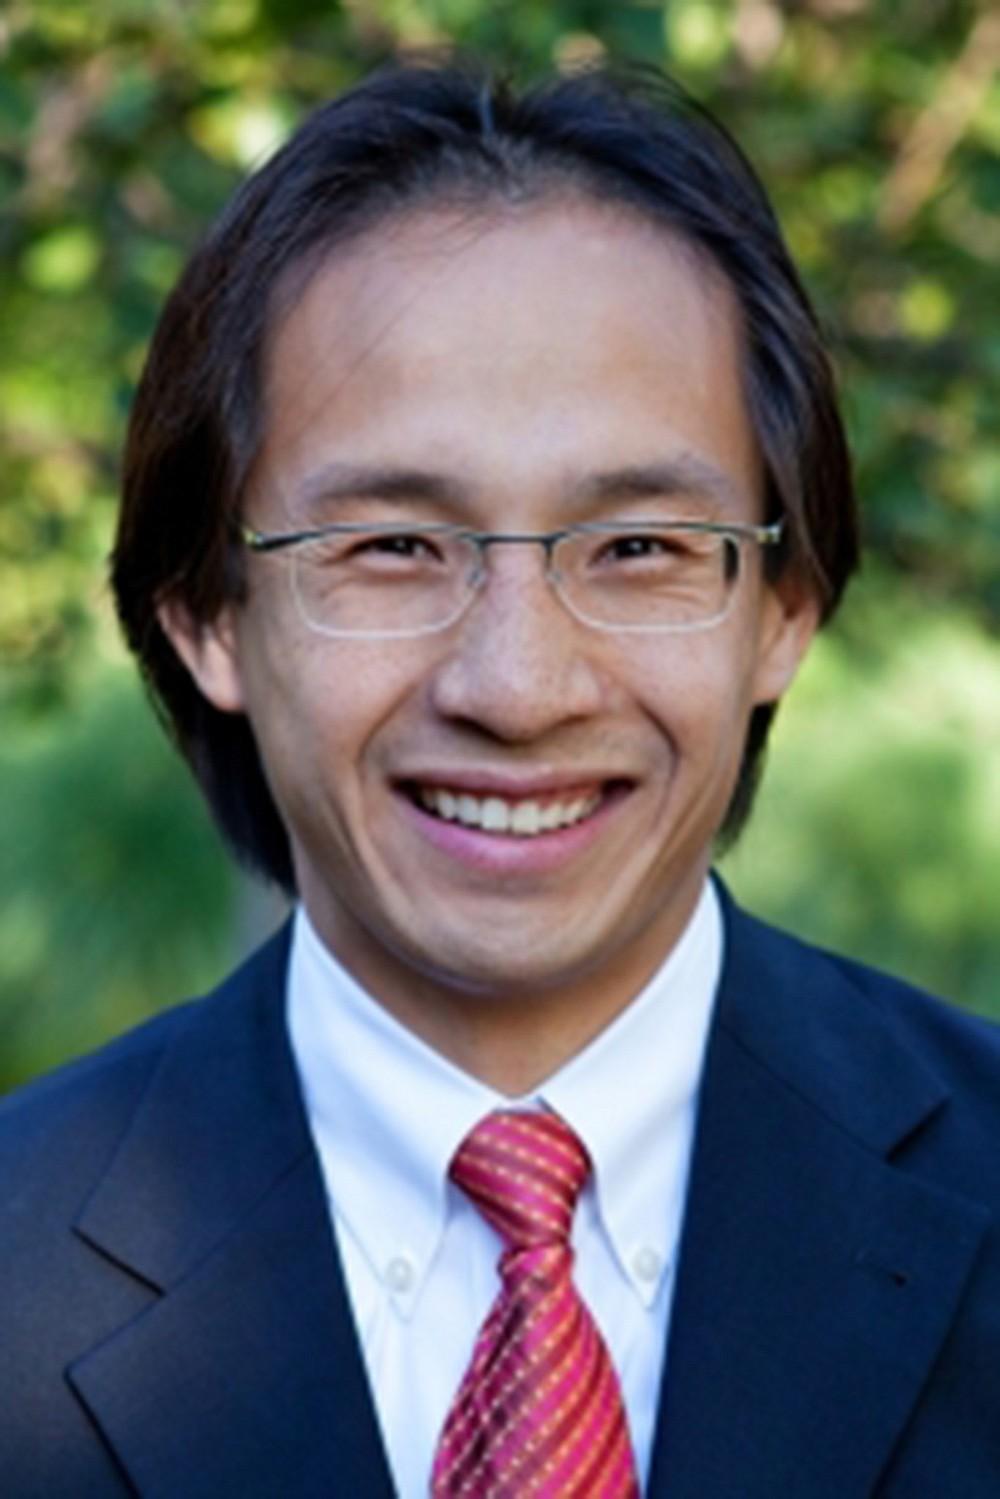 A budget increase of $900,000 makes registrar Michael Vu smile.